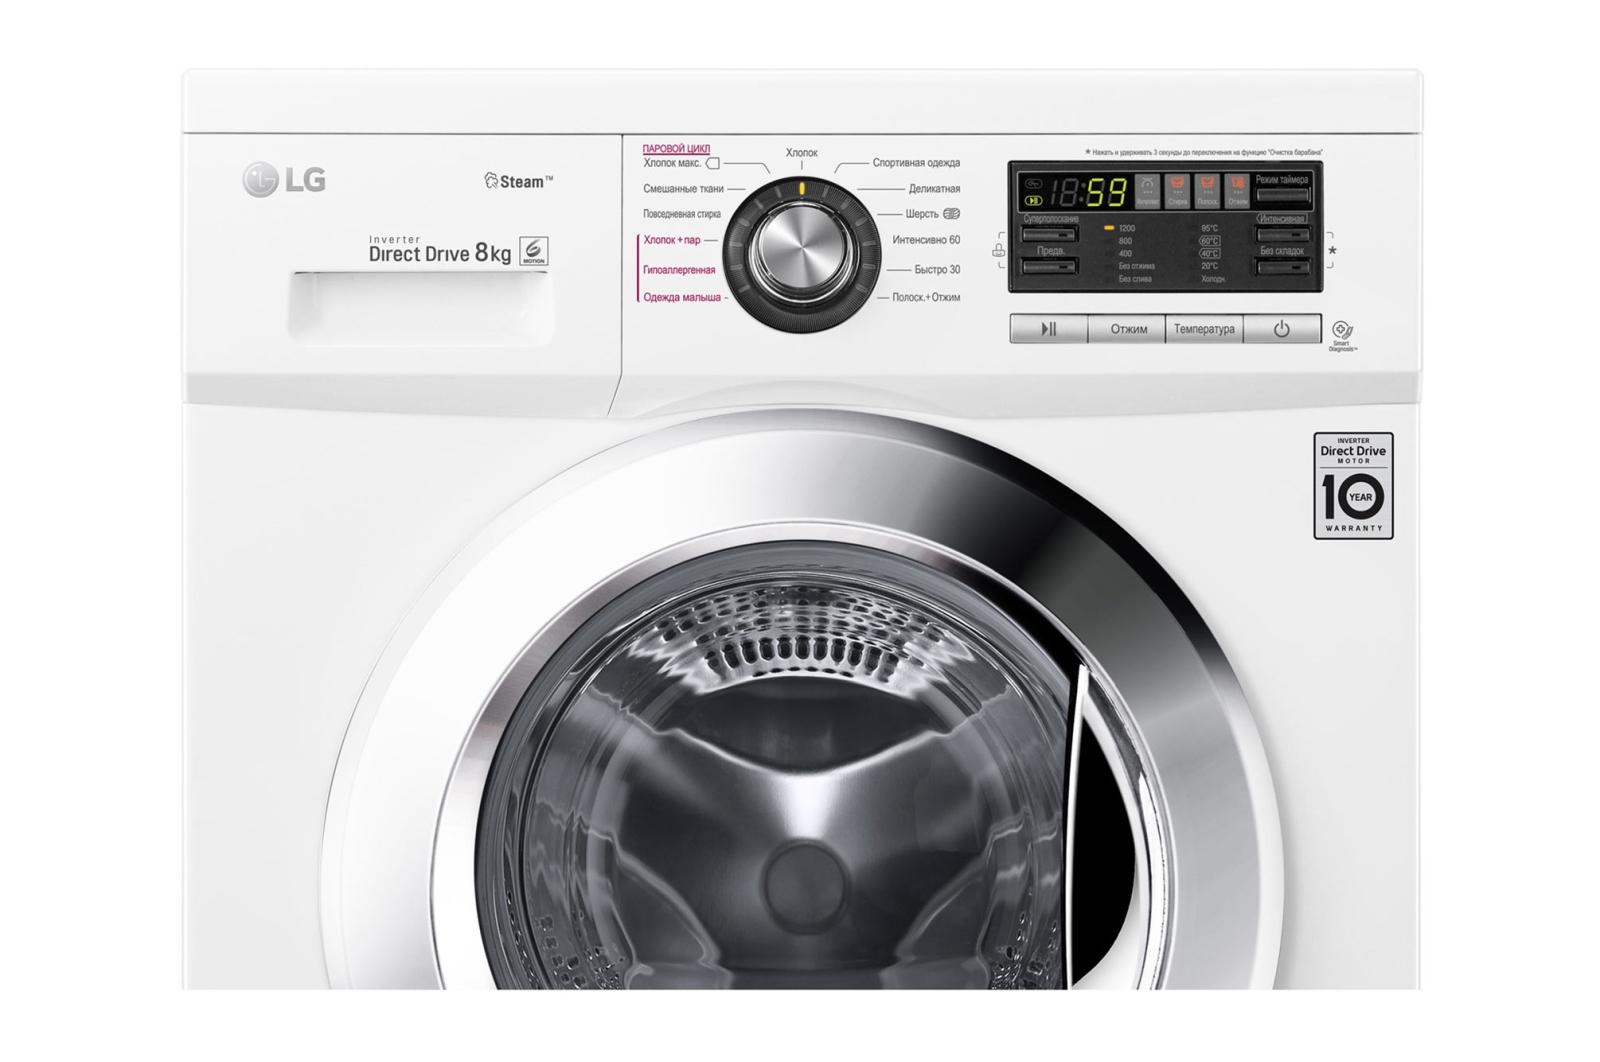 код ошибки uE стиральная машина LG